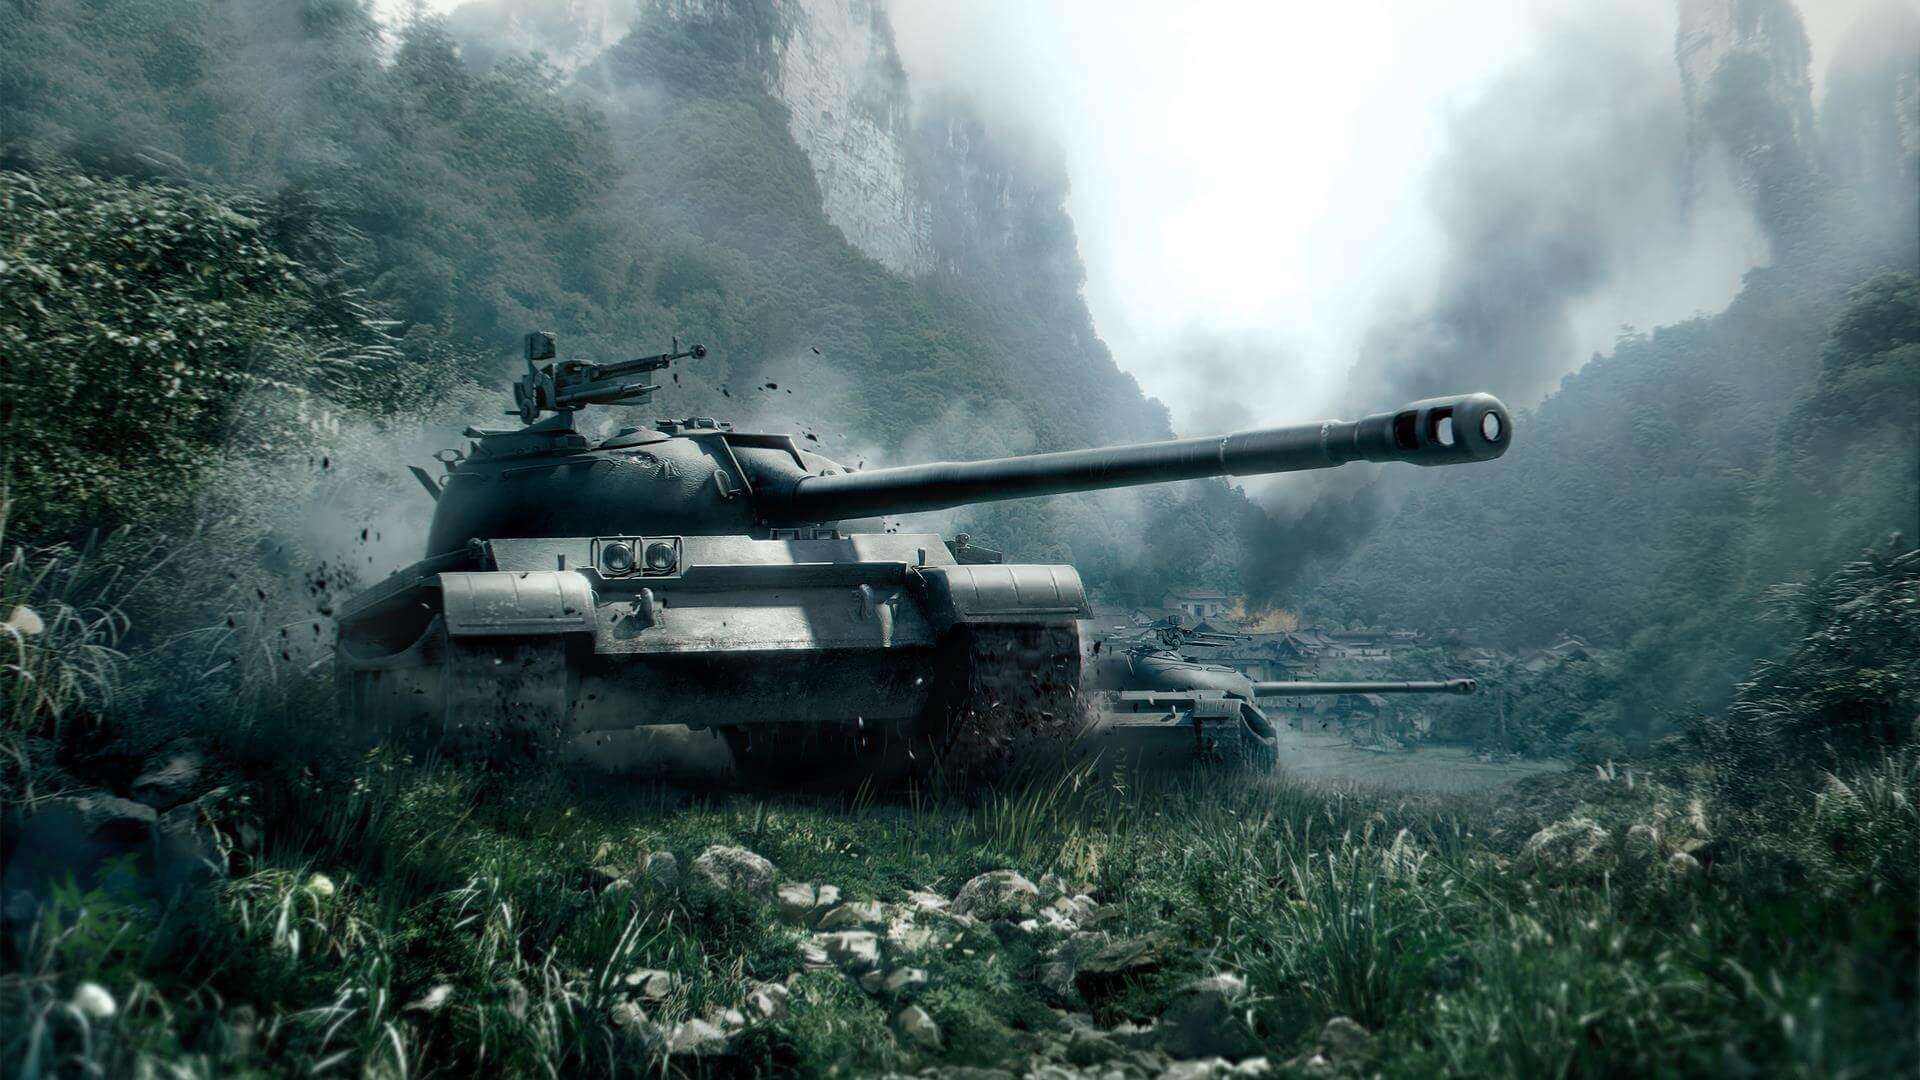 World Of Tanks Wallpaper Hd Impremedia Net